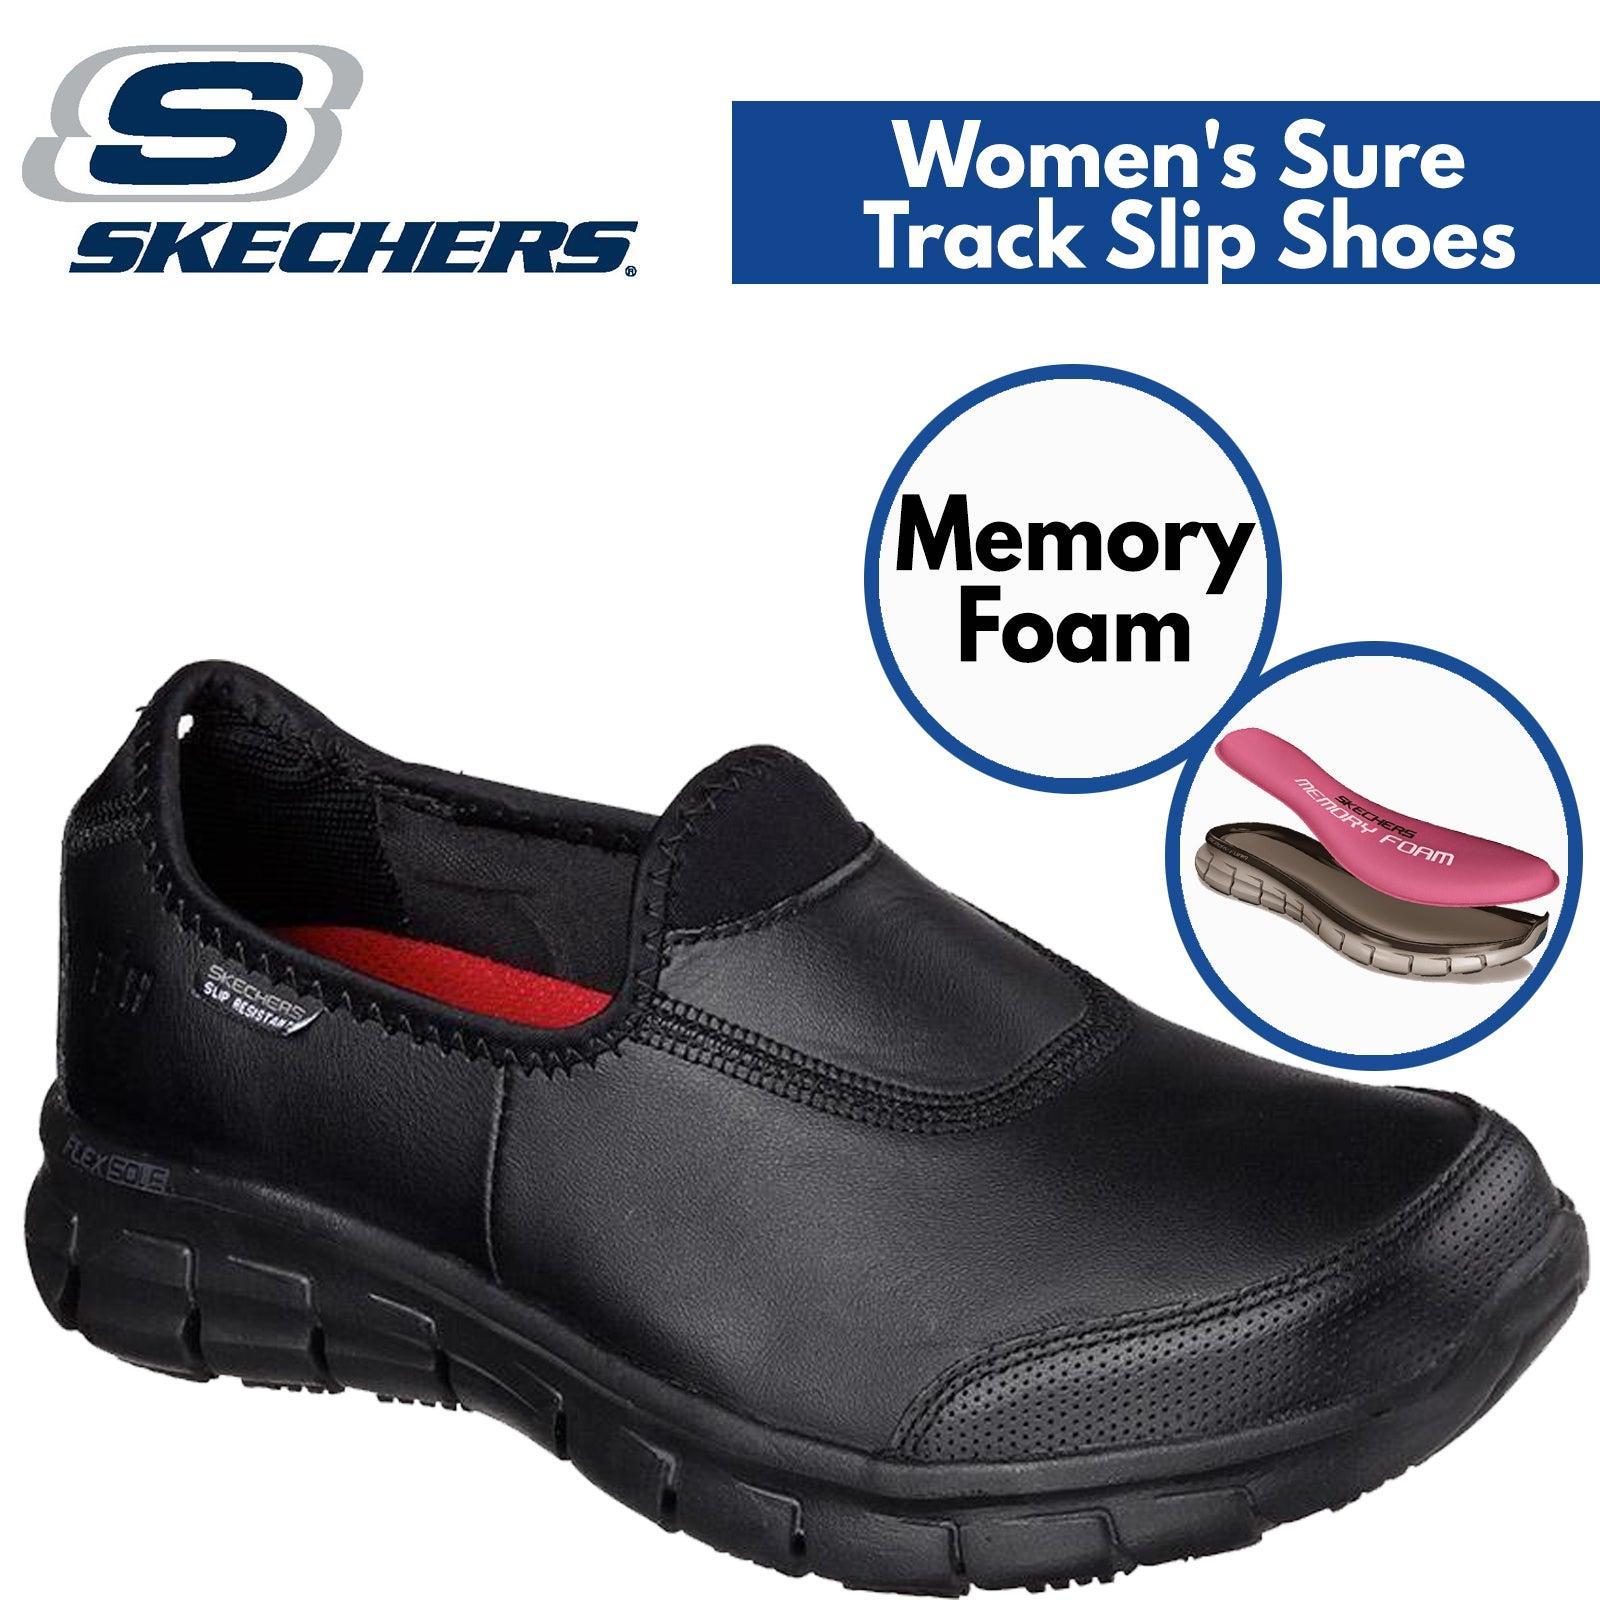 Skechers Women's Sure Track Slip